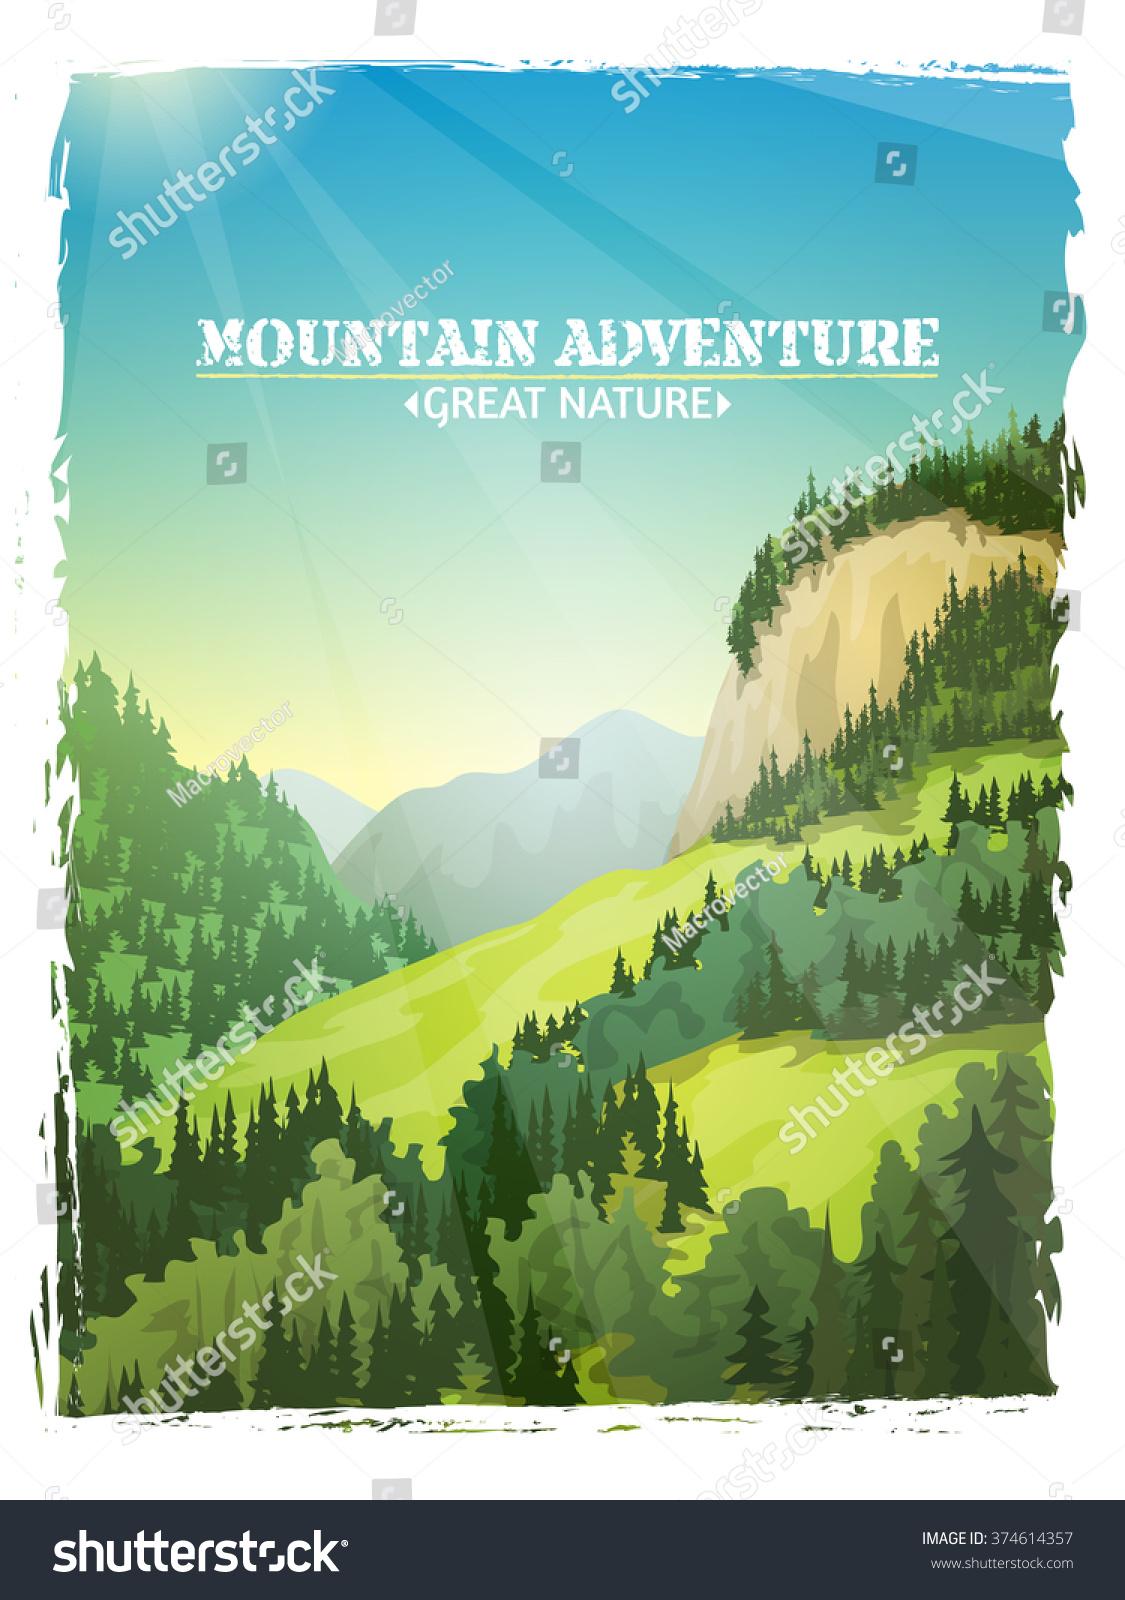 Poster design landscape - Mountains Sunny Green Slopes Landscape Design Travel Outdoor Adventures Background Poster Abstract Illustration Vector